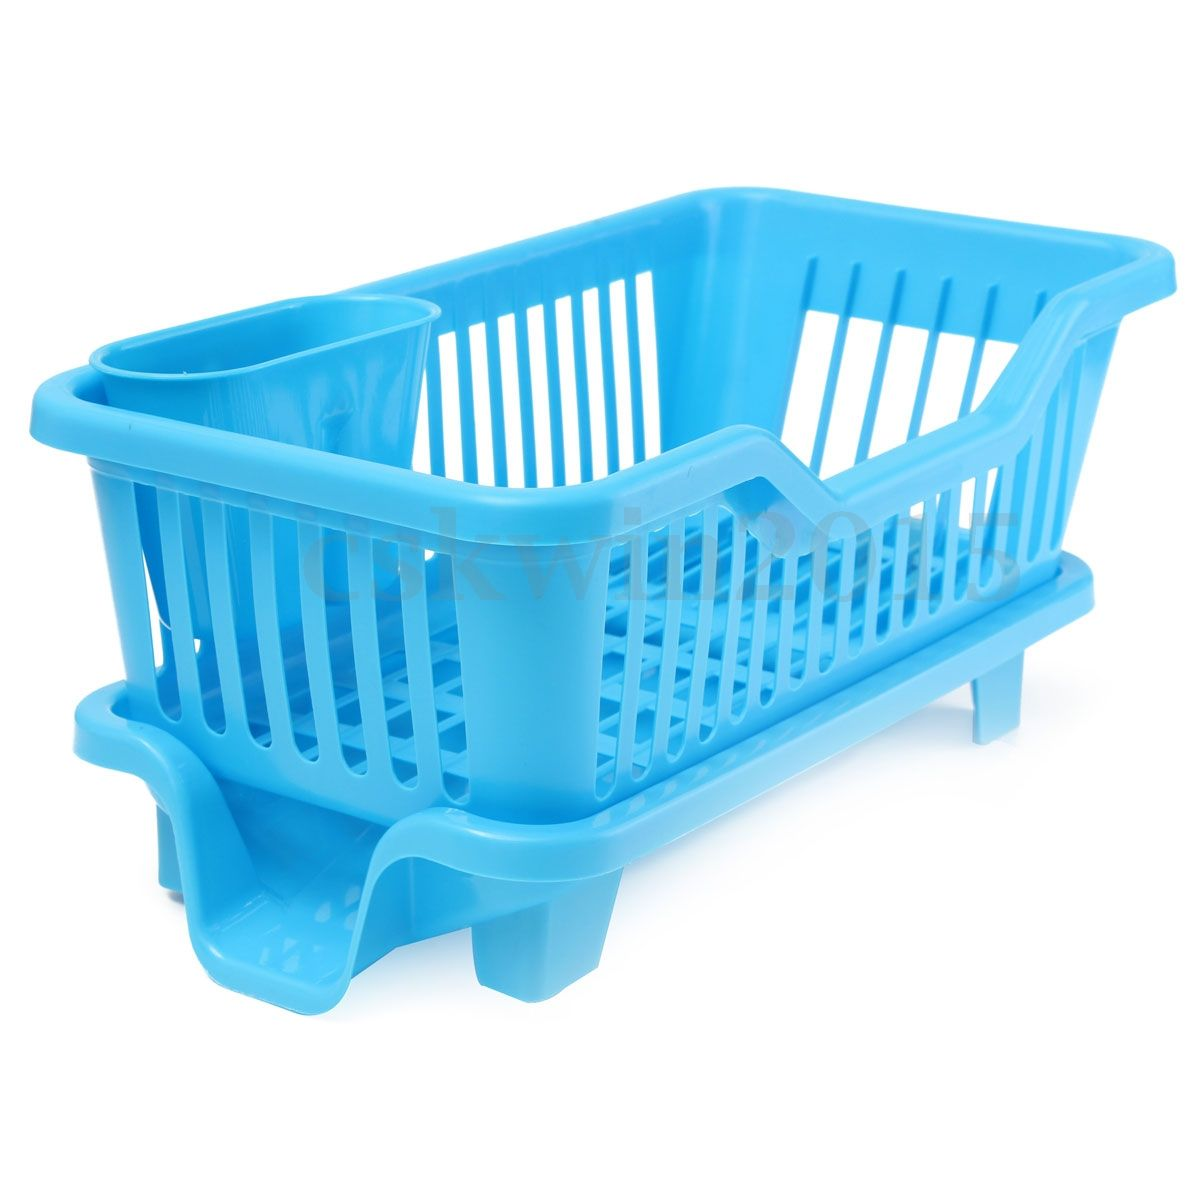 Kitchen Dish Cup Sink Drainer Drying Rack Washing Holder Basket ...